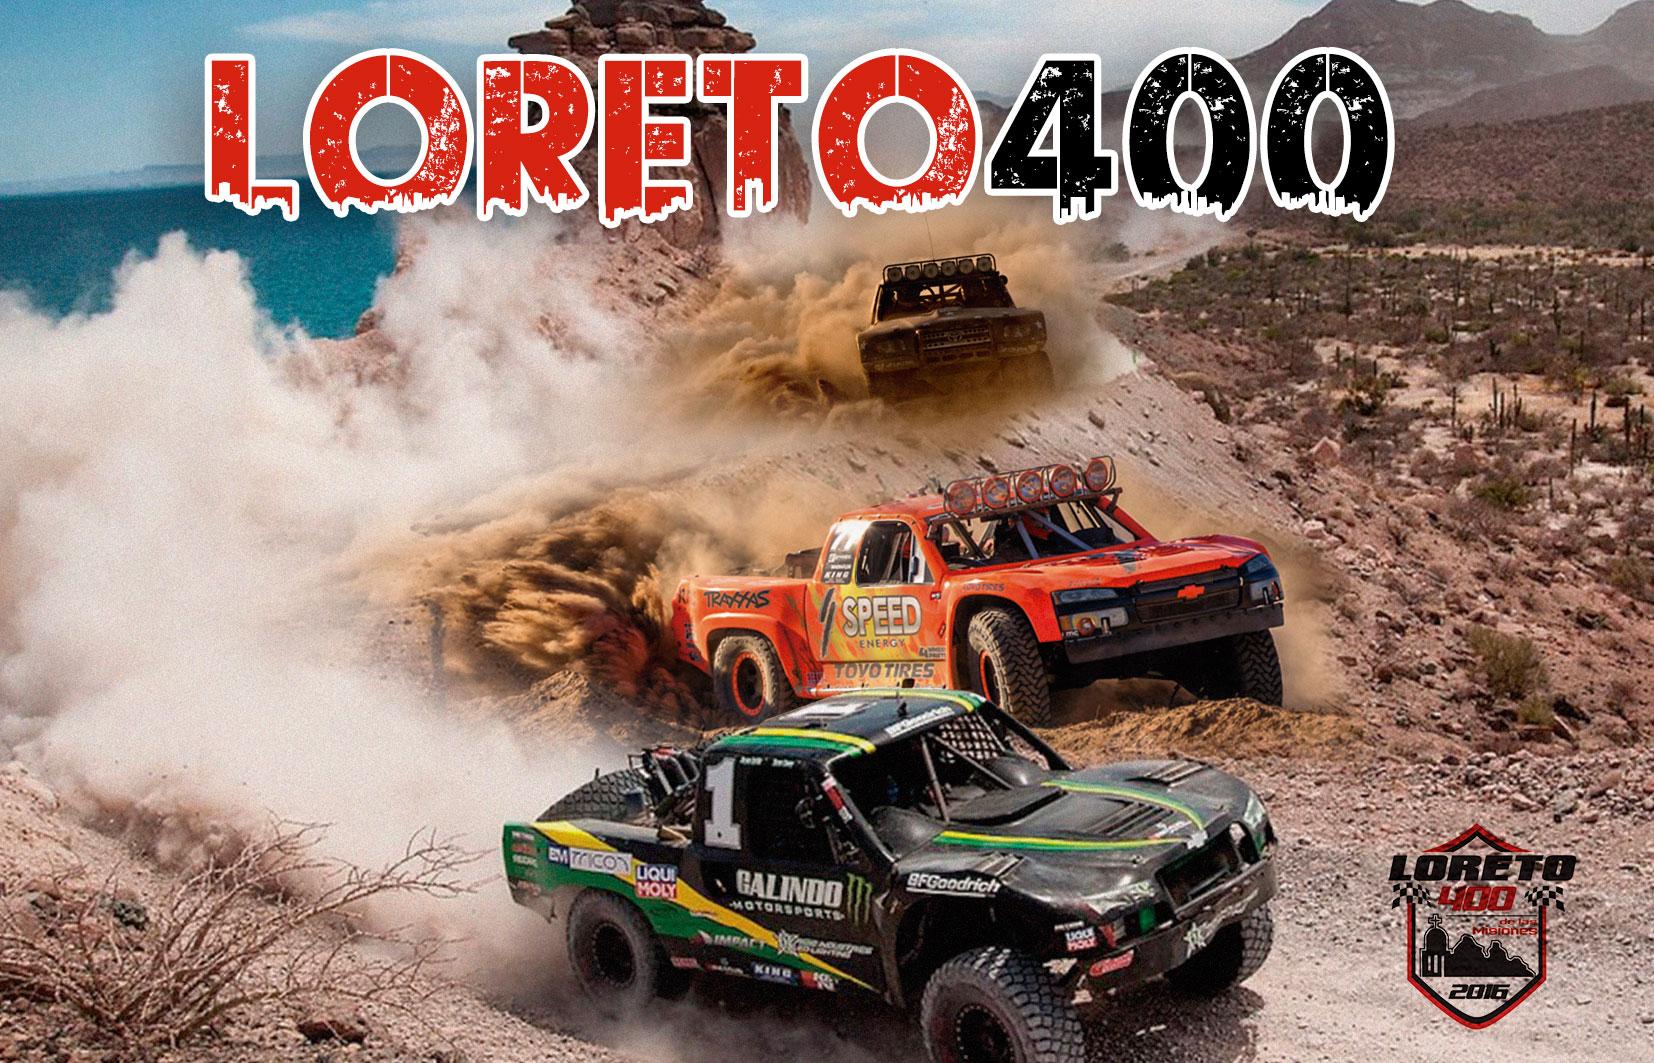 Loreto Event